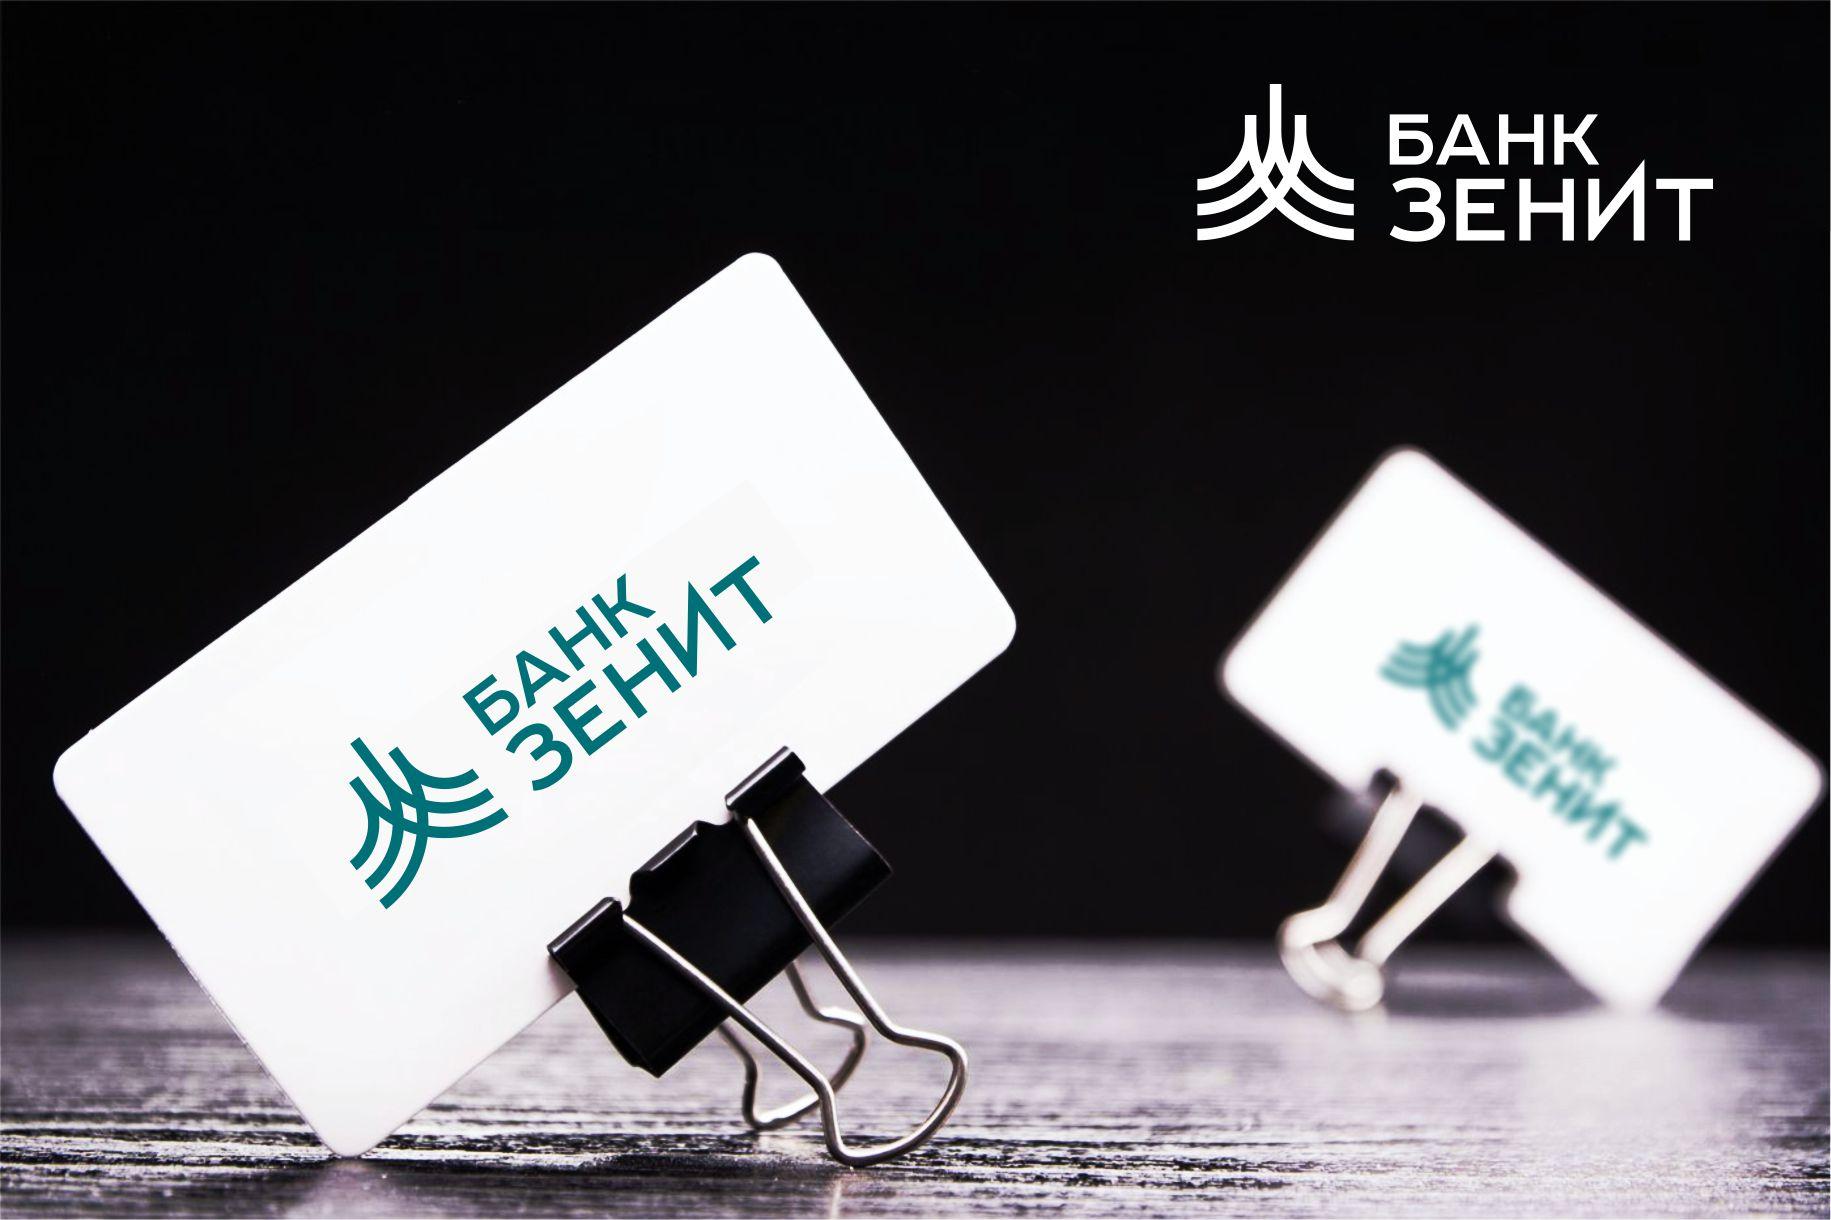 Разработка логотипа для Банка ЗЕНИТ фото f_4455b4bb057164f9.jpg